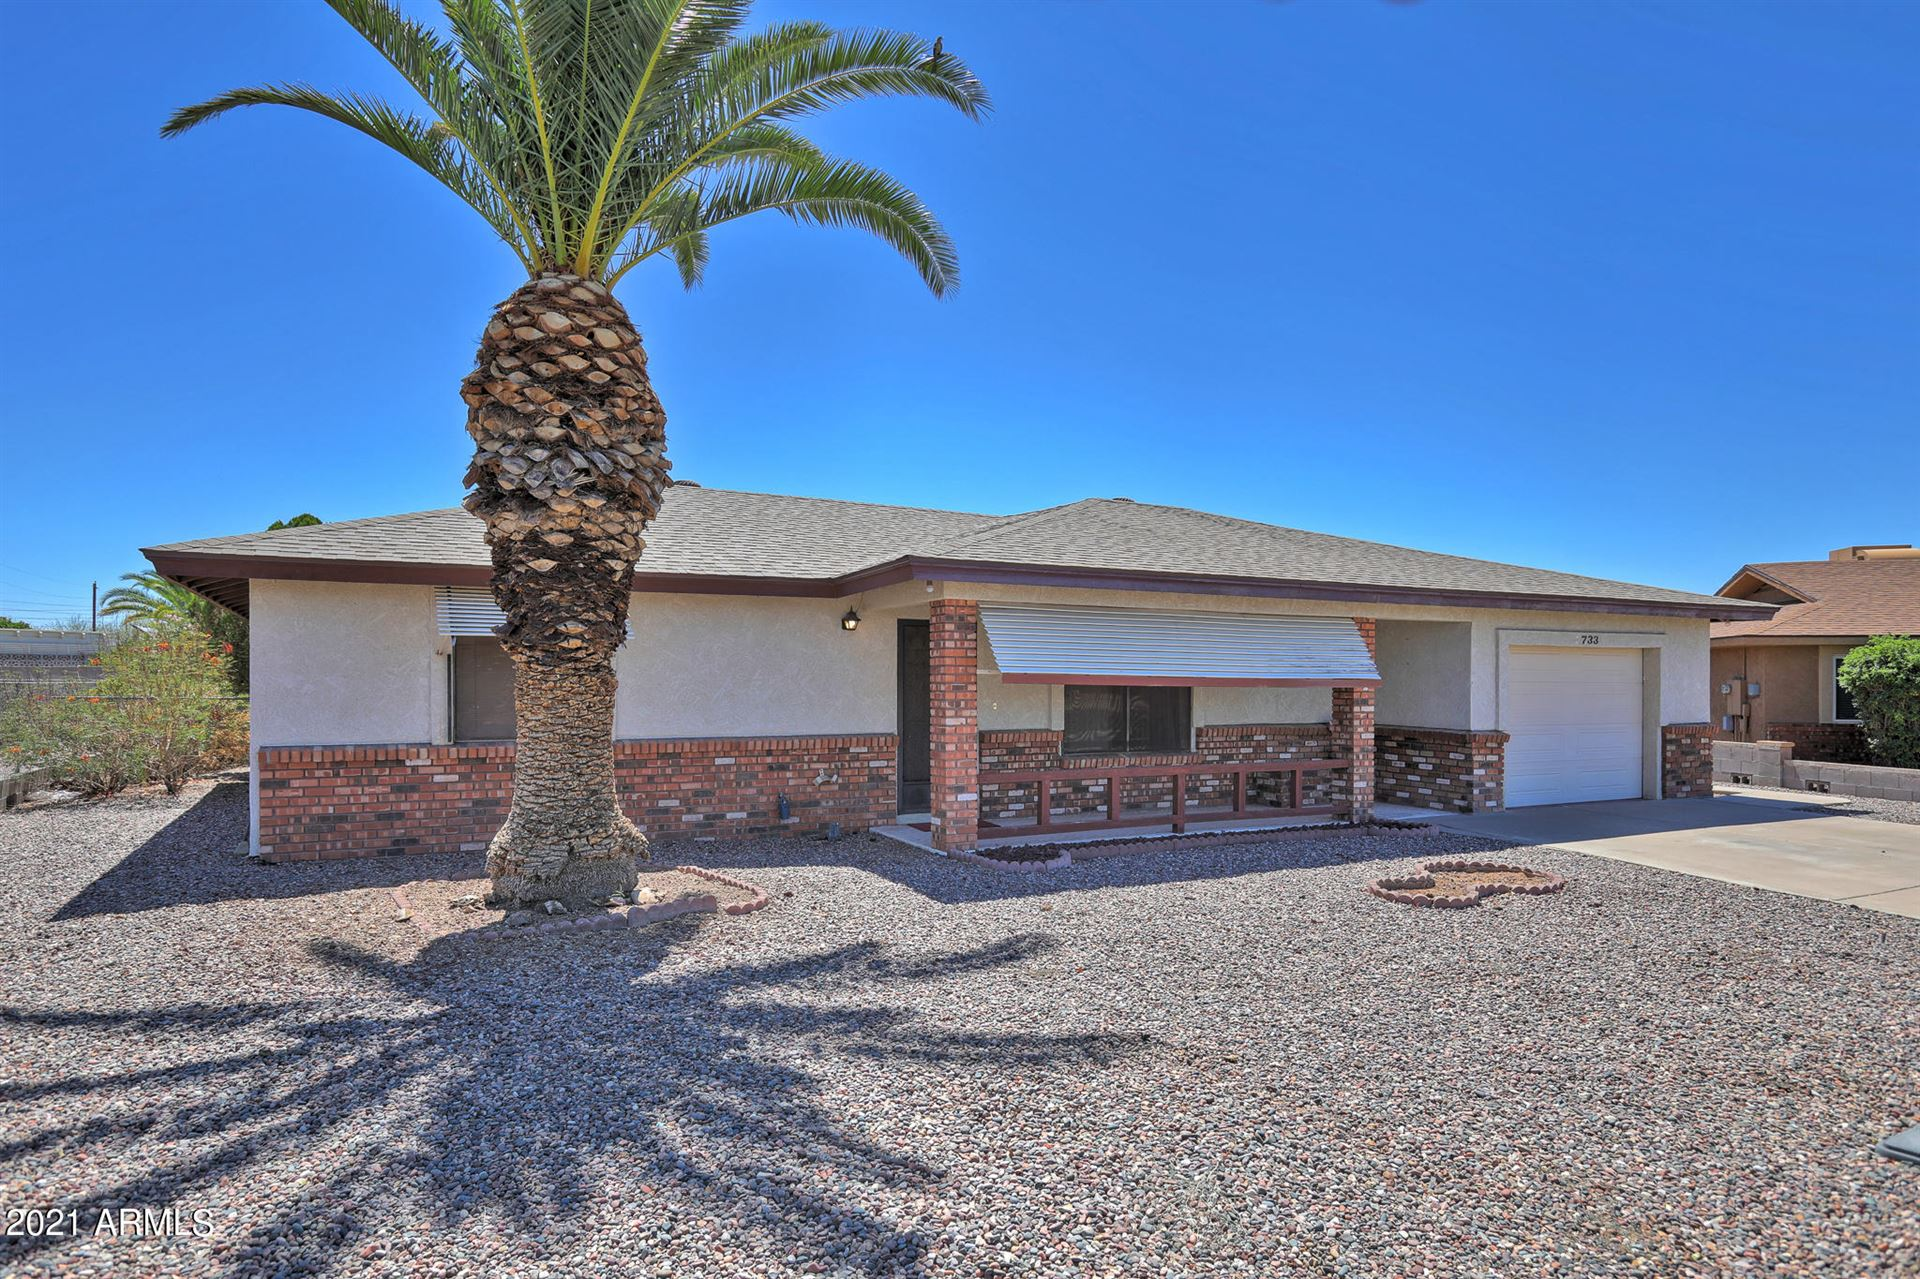 Photo of 733 N 66TH Way, Mesa, AZ 85205 (MLS # 6249760)